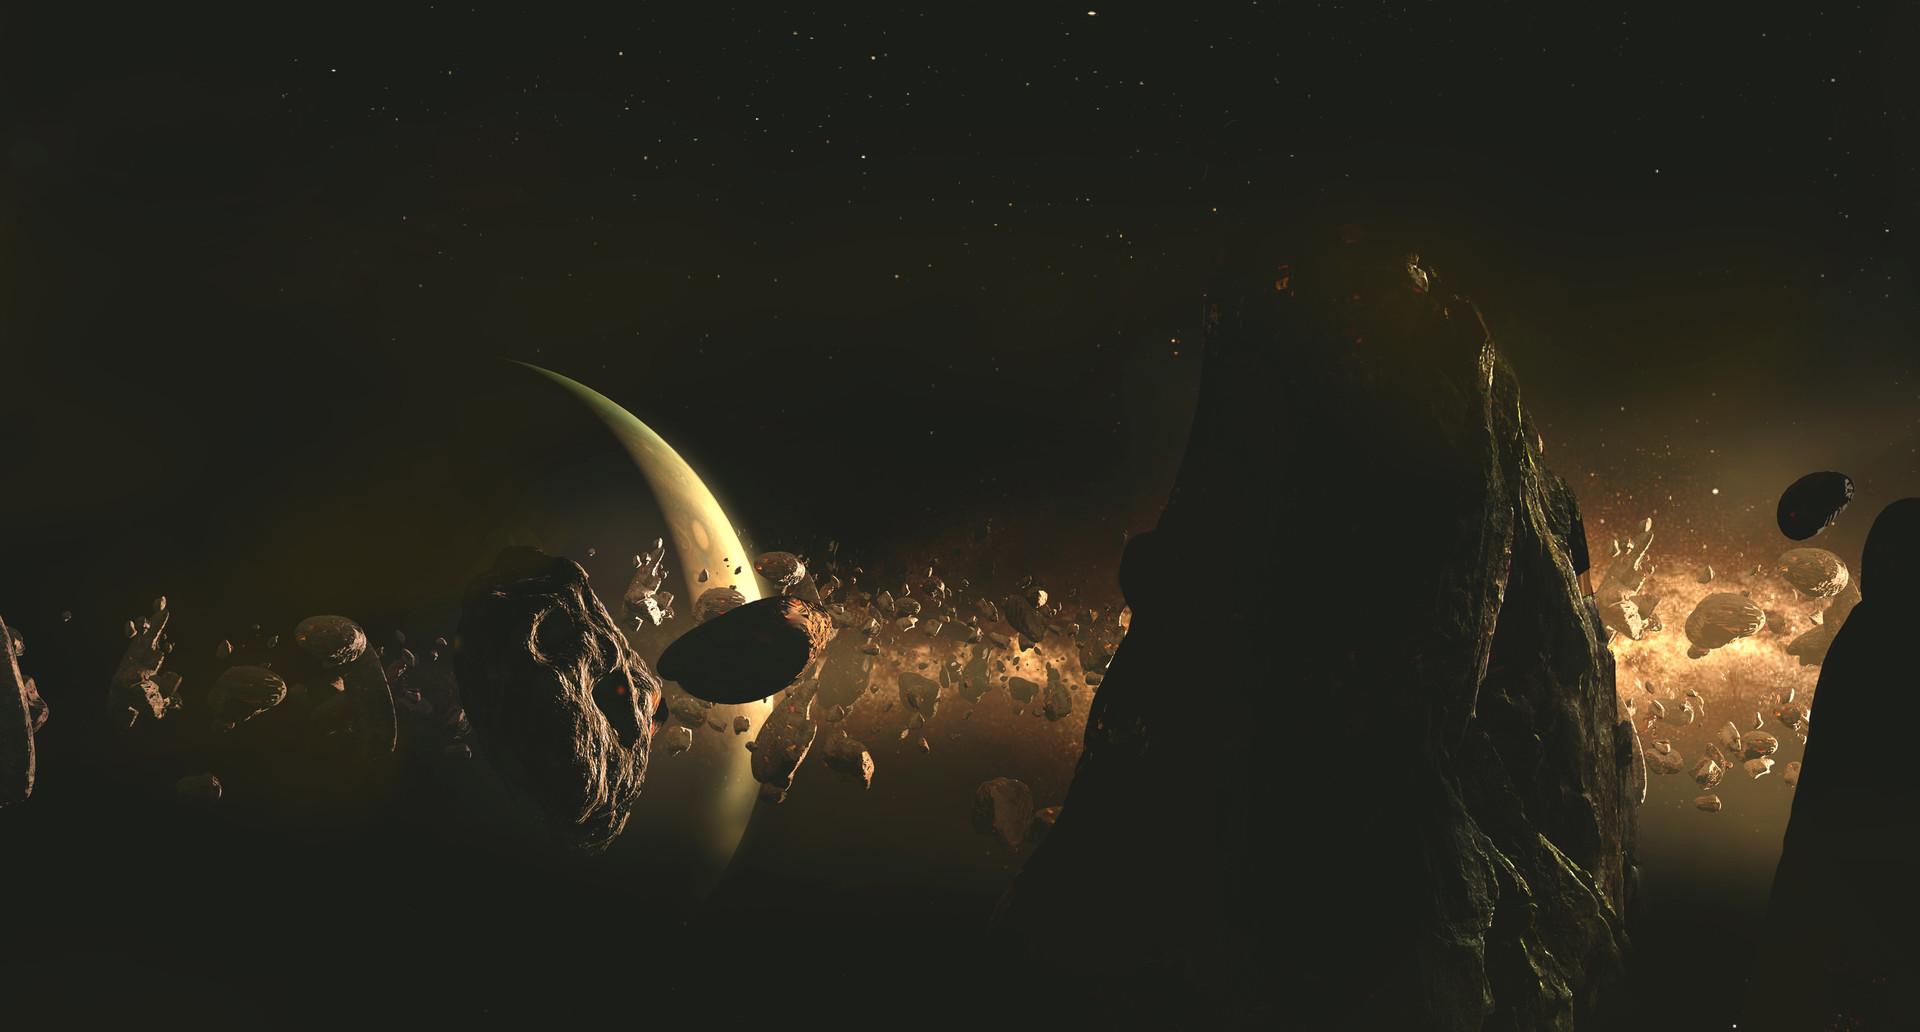 Kevin moran asteroidbelt01